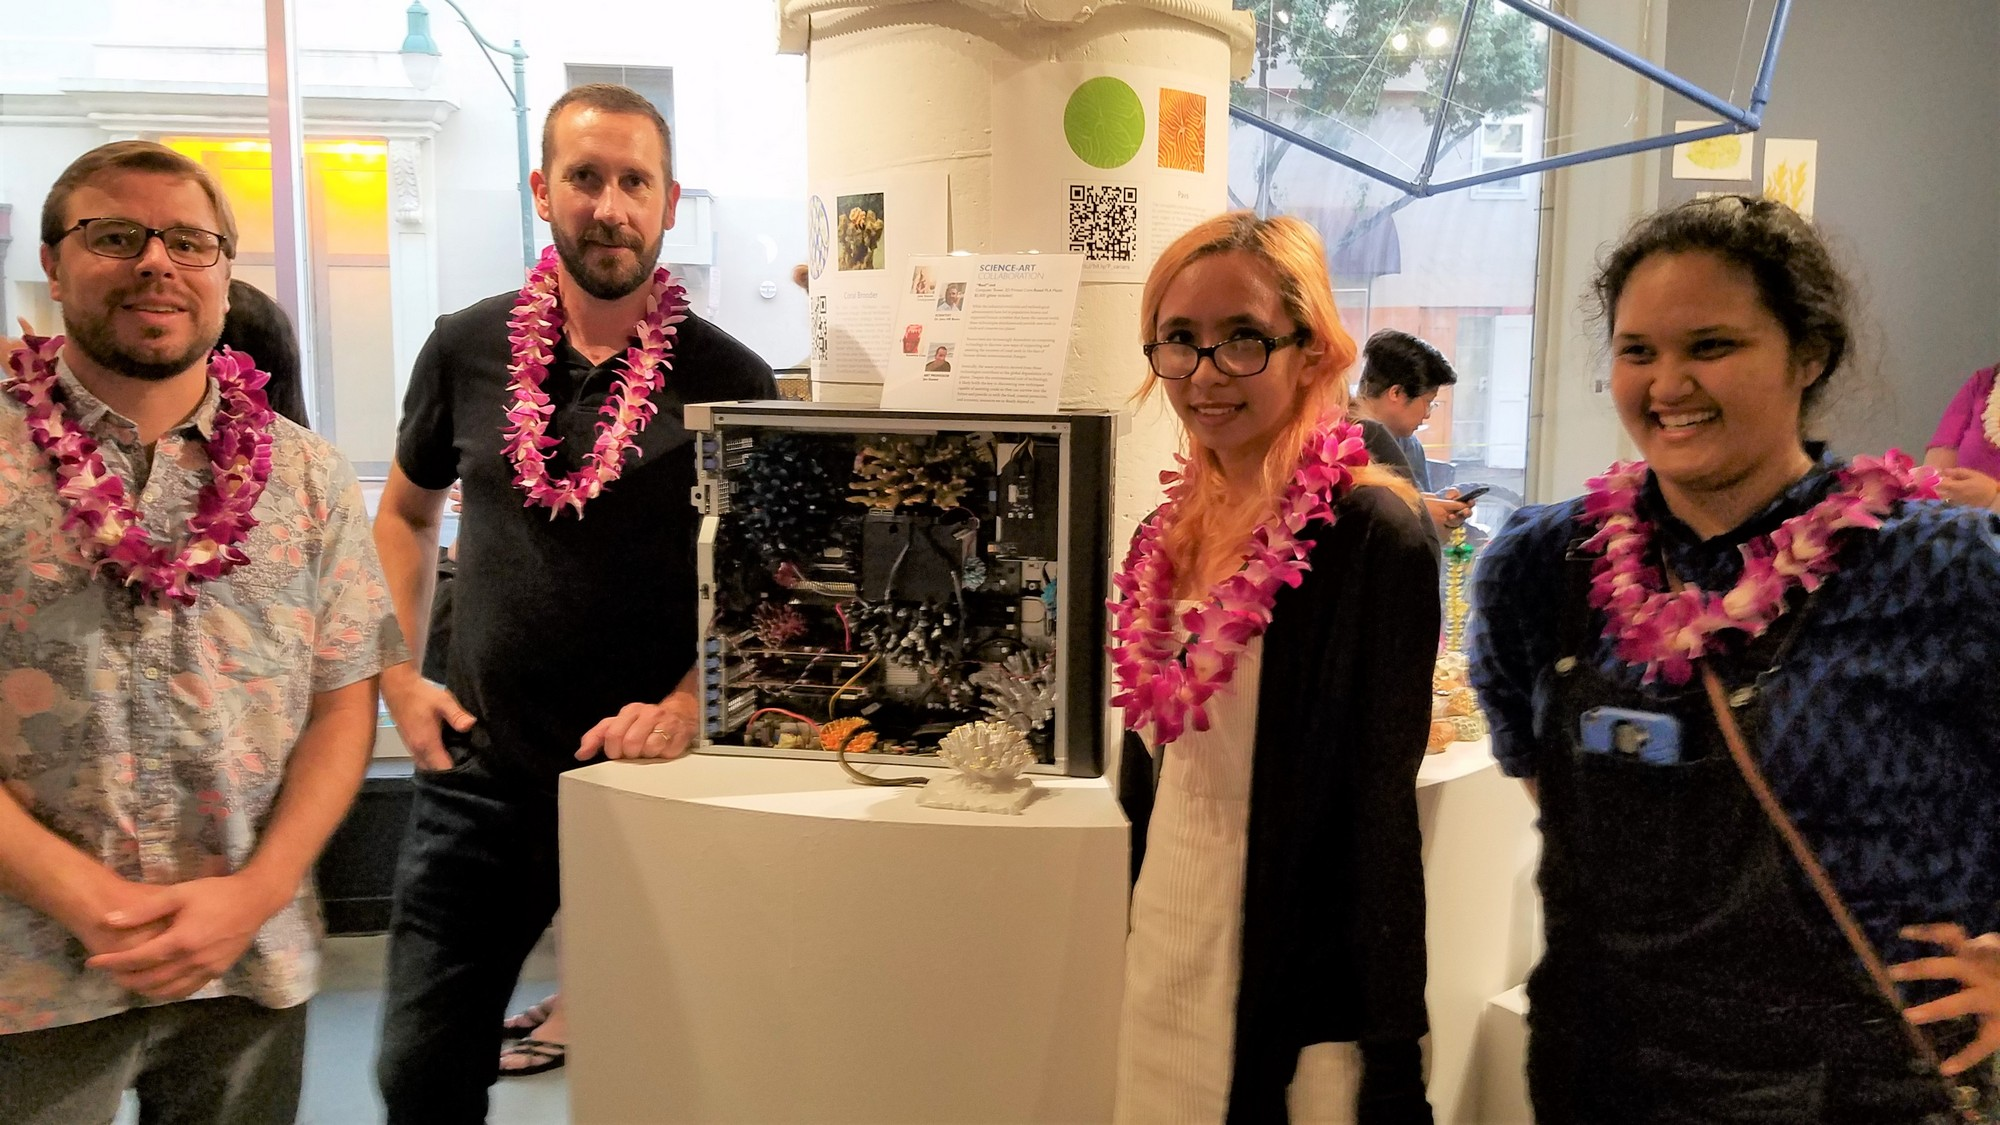 John Burns, Jon Goebel, Jade Kauwe, and Kawelina Cruz stand next to their 3D artwork of corals.